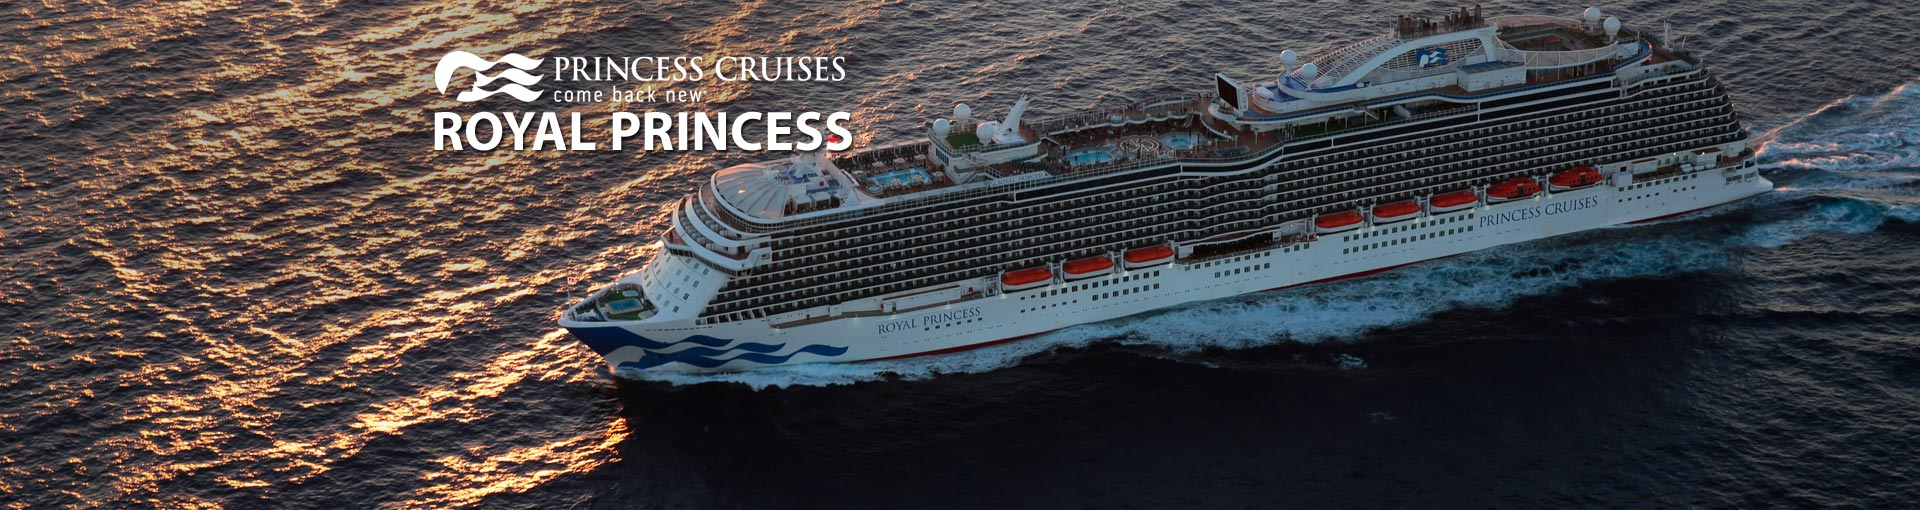 Deals on cruises 2018